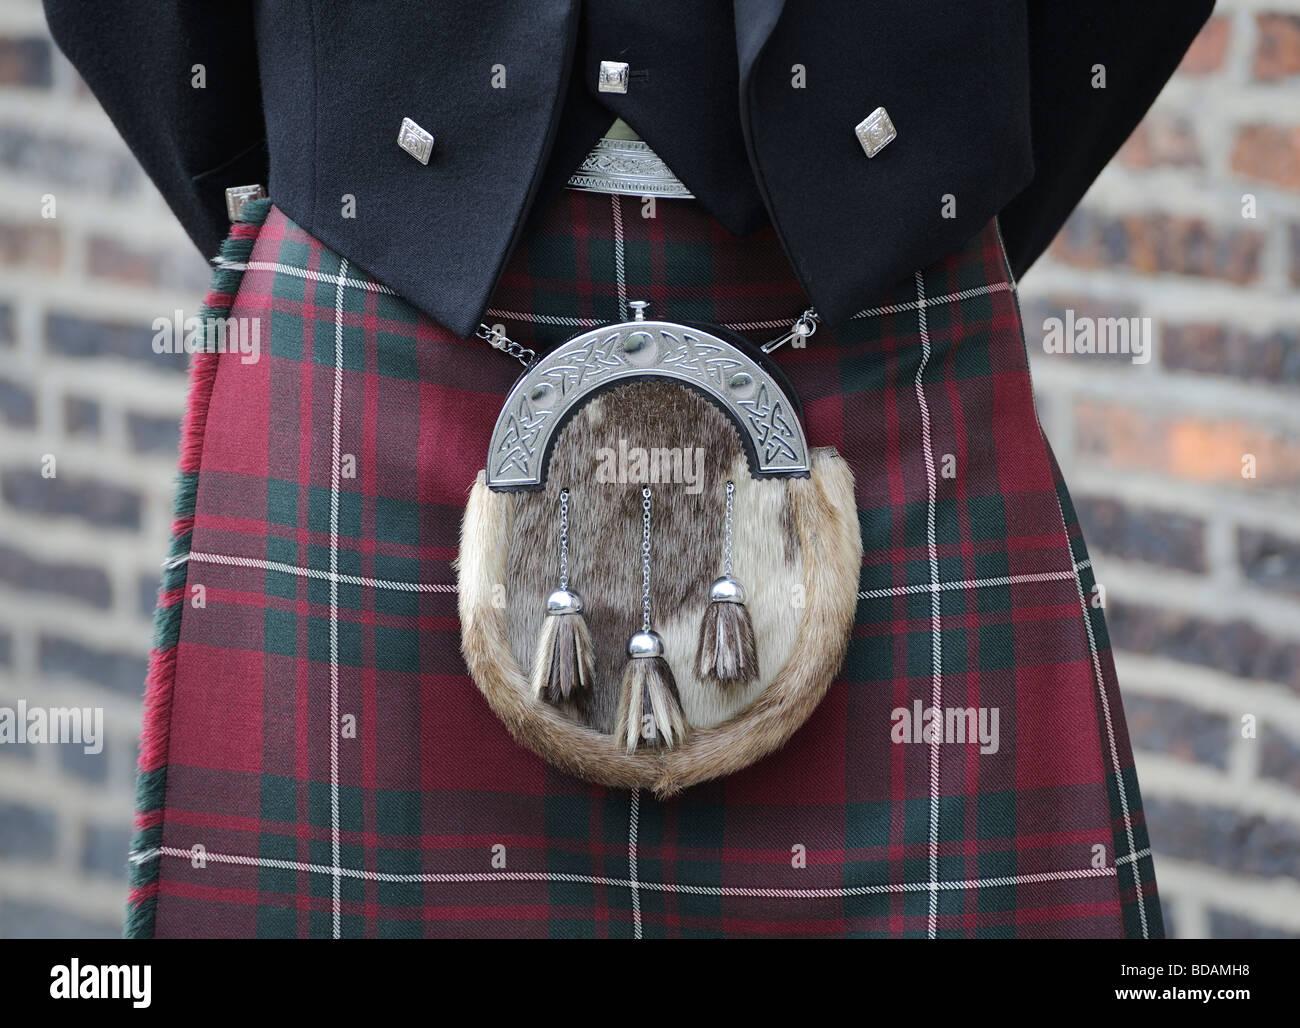 Scotland Sporran Kilt Scotland traditional dress Tartan - Stock Image